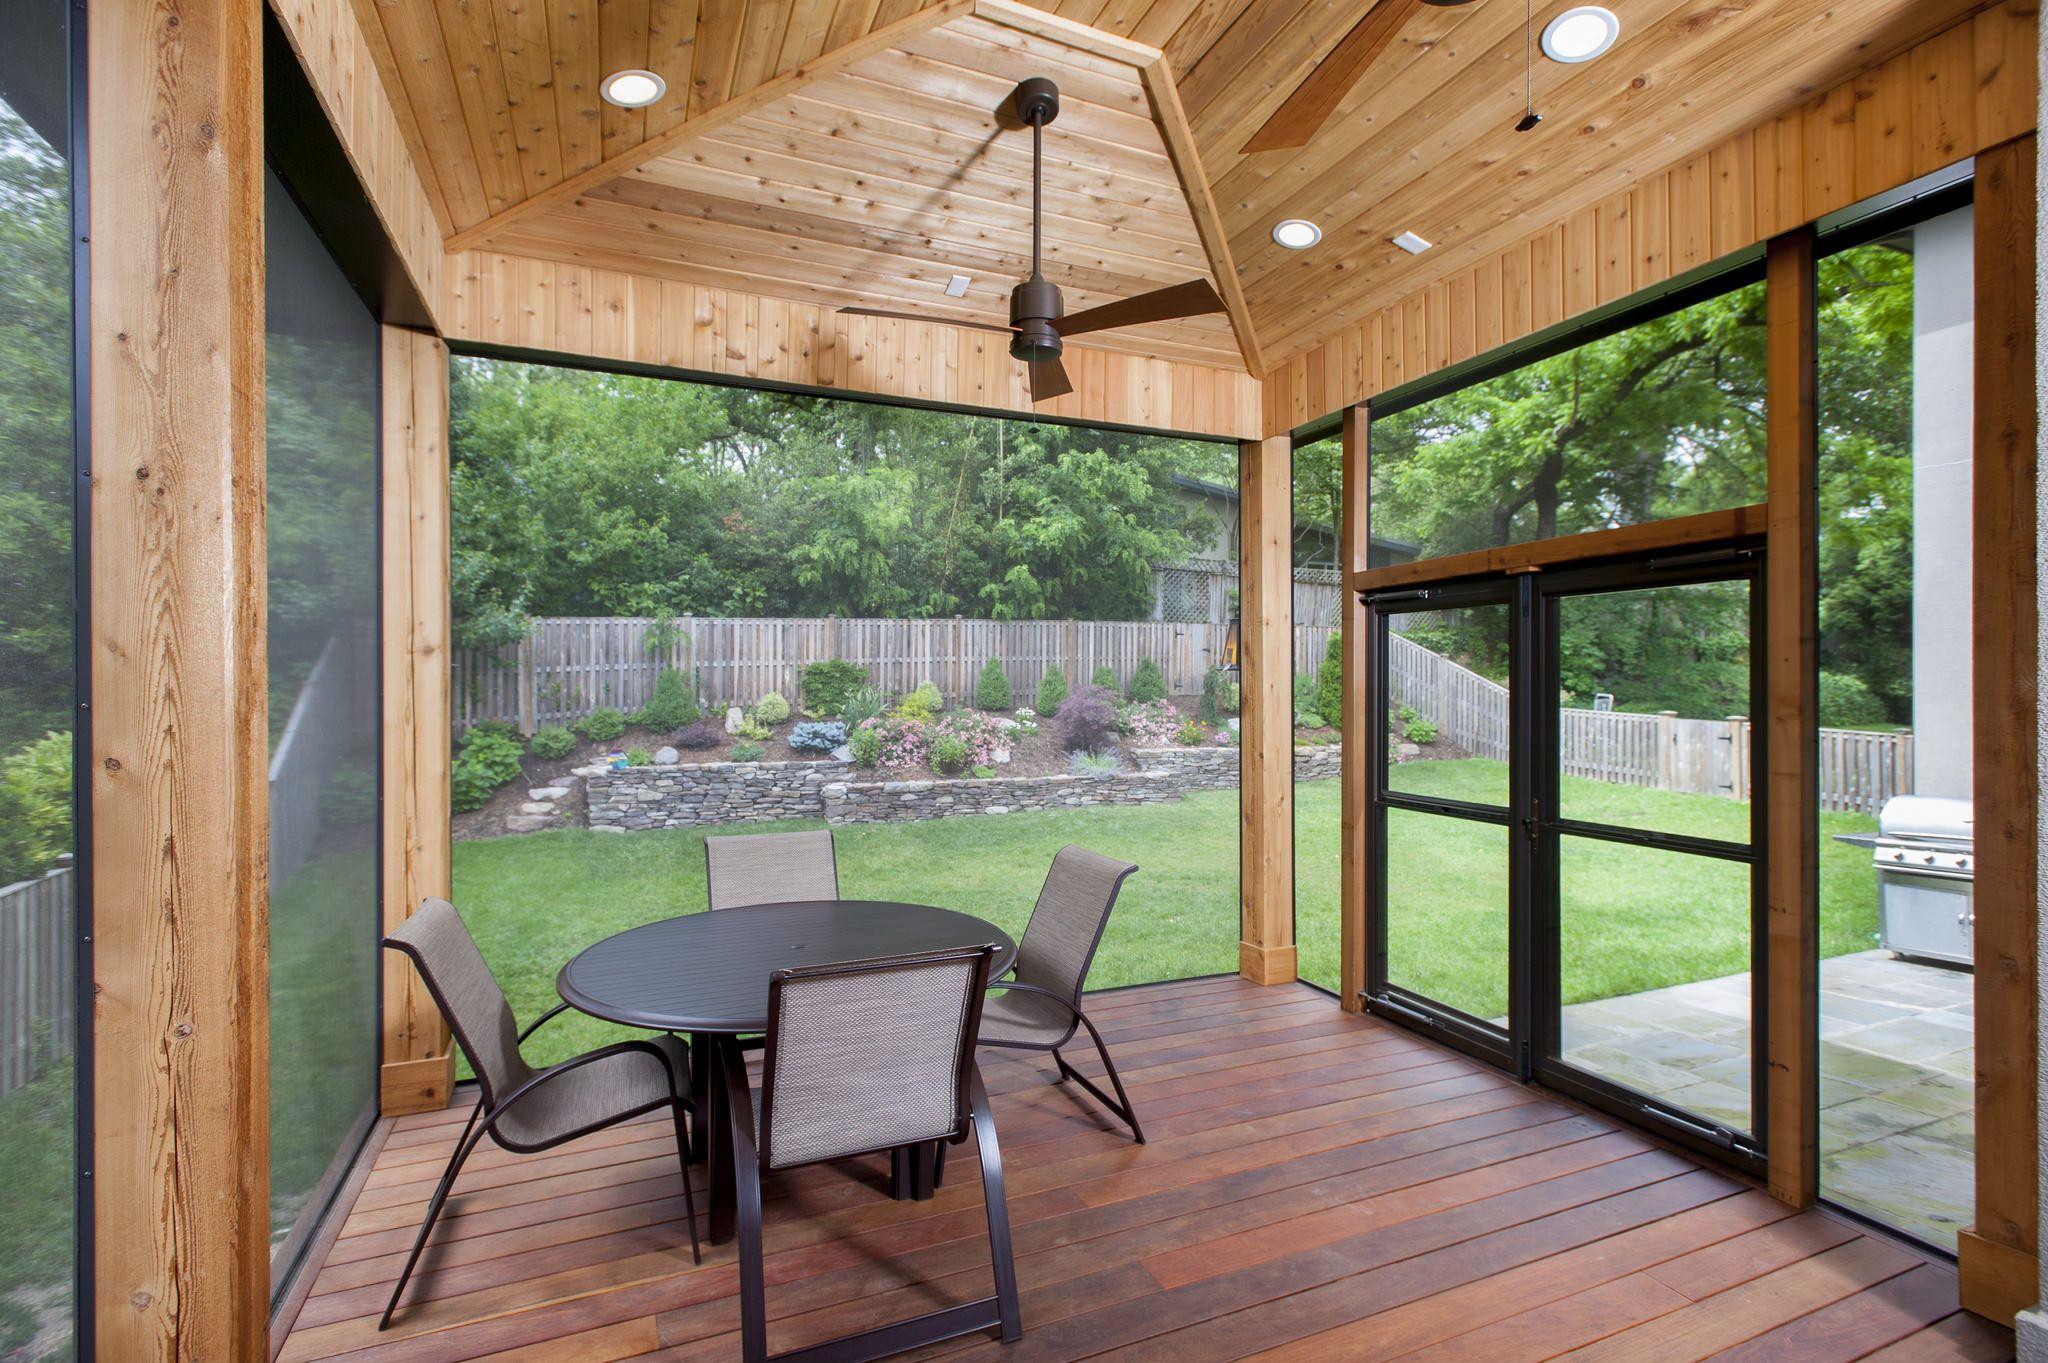 Unique Bethesda Screened Porch Porch Design Screened Porch Designs Retractable Screen Porch